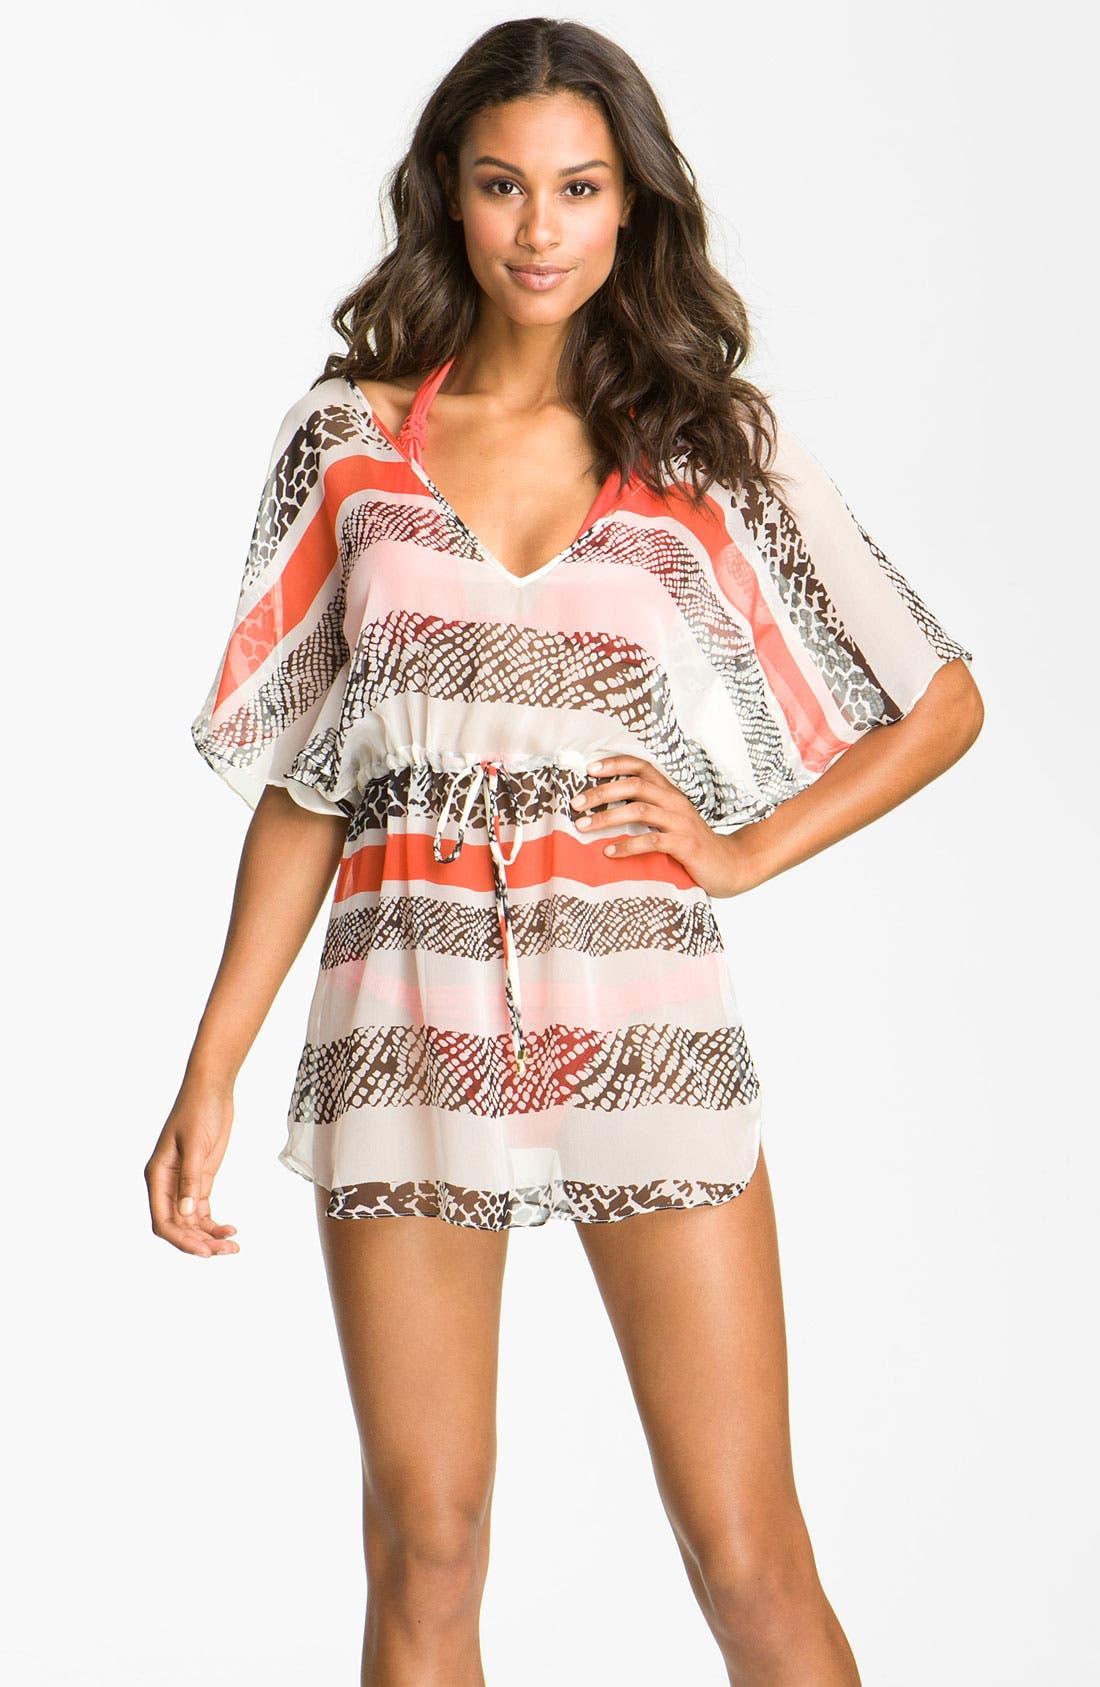 Alternate Image 1 Selected - ViX Swimwear 'Leblon Lina' Silk Caftan Cover-Up